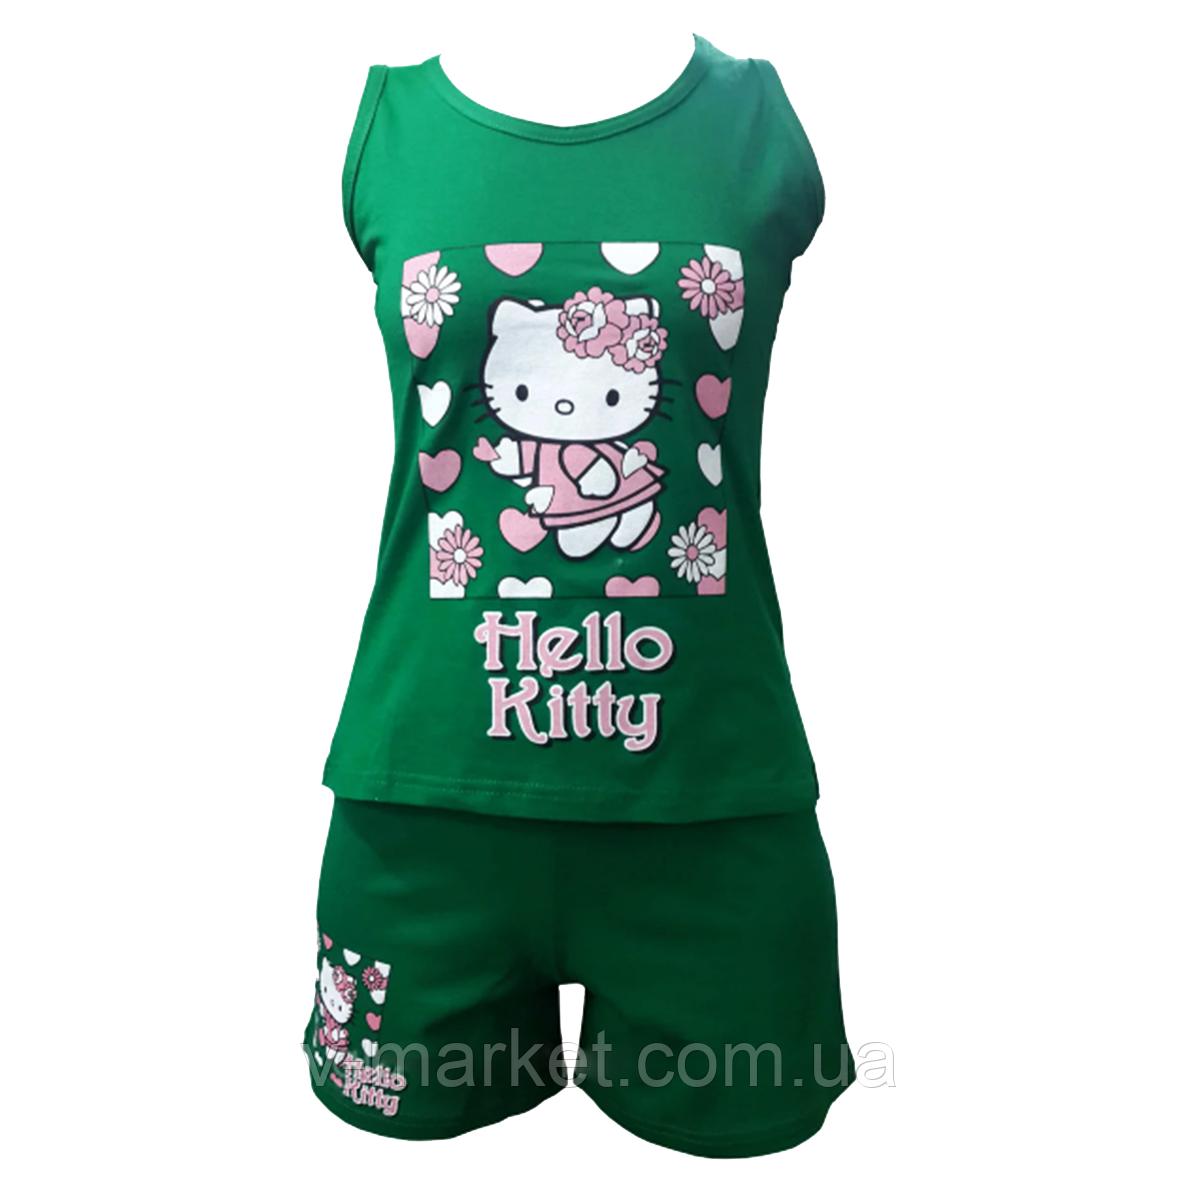 Летняя пижама женская с шортами Hello Kitty, ткань трикотаж, размер 42-46